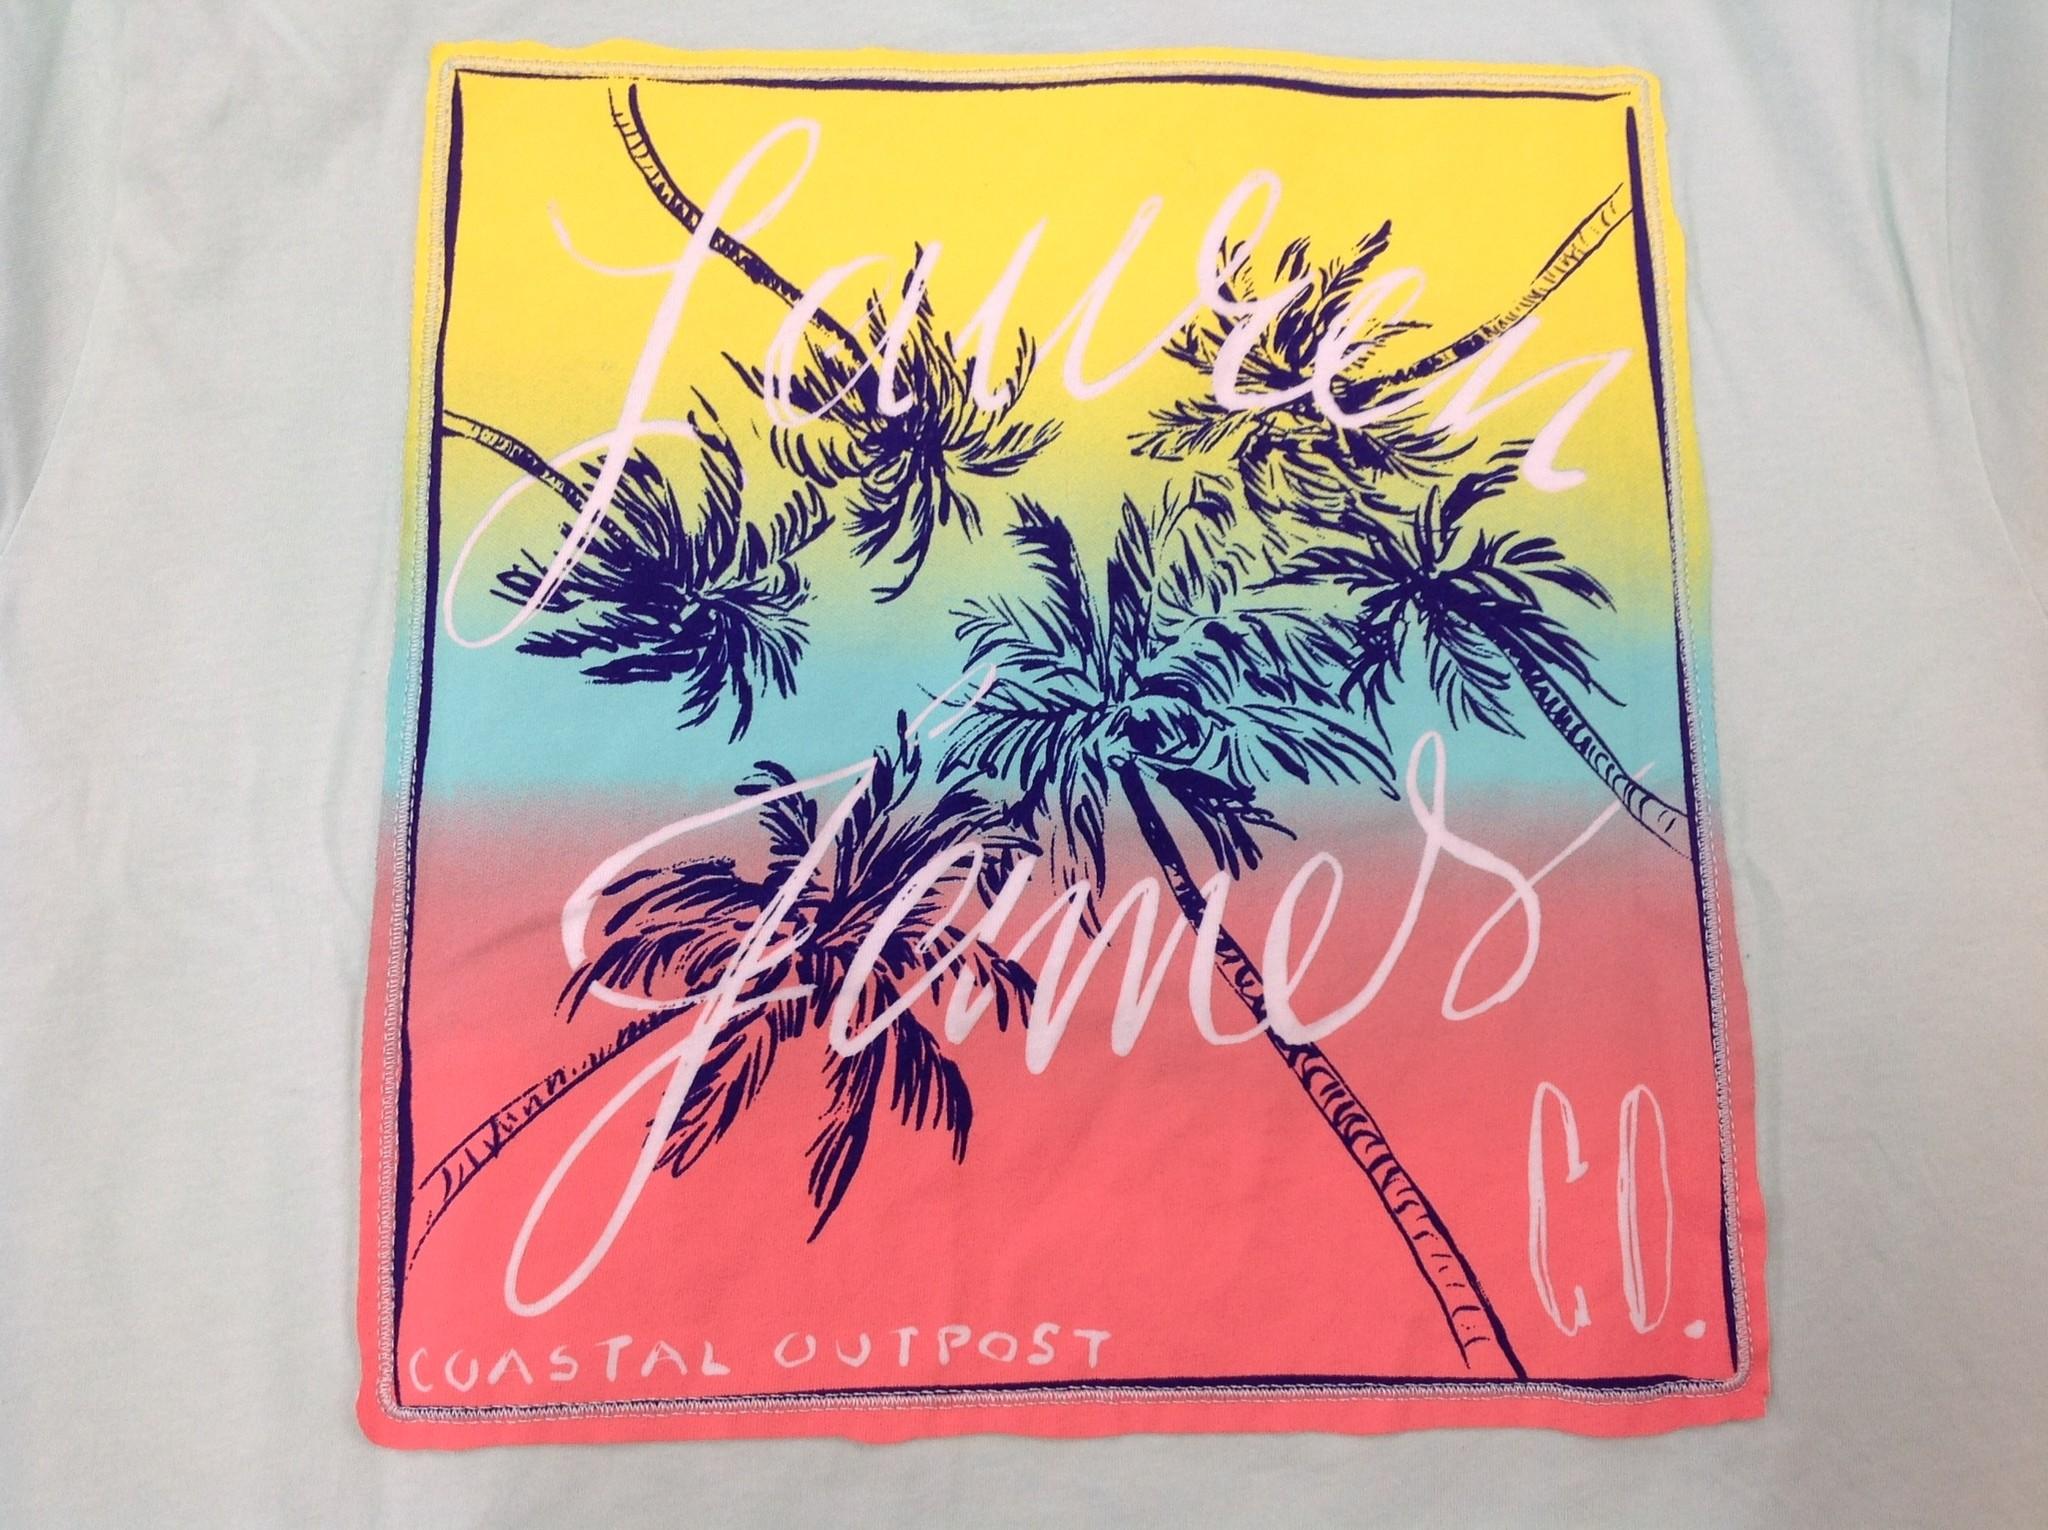 Lauren James Coastal Outpost T-shirt